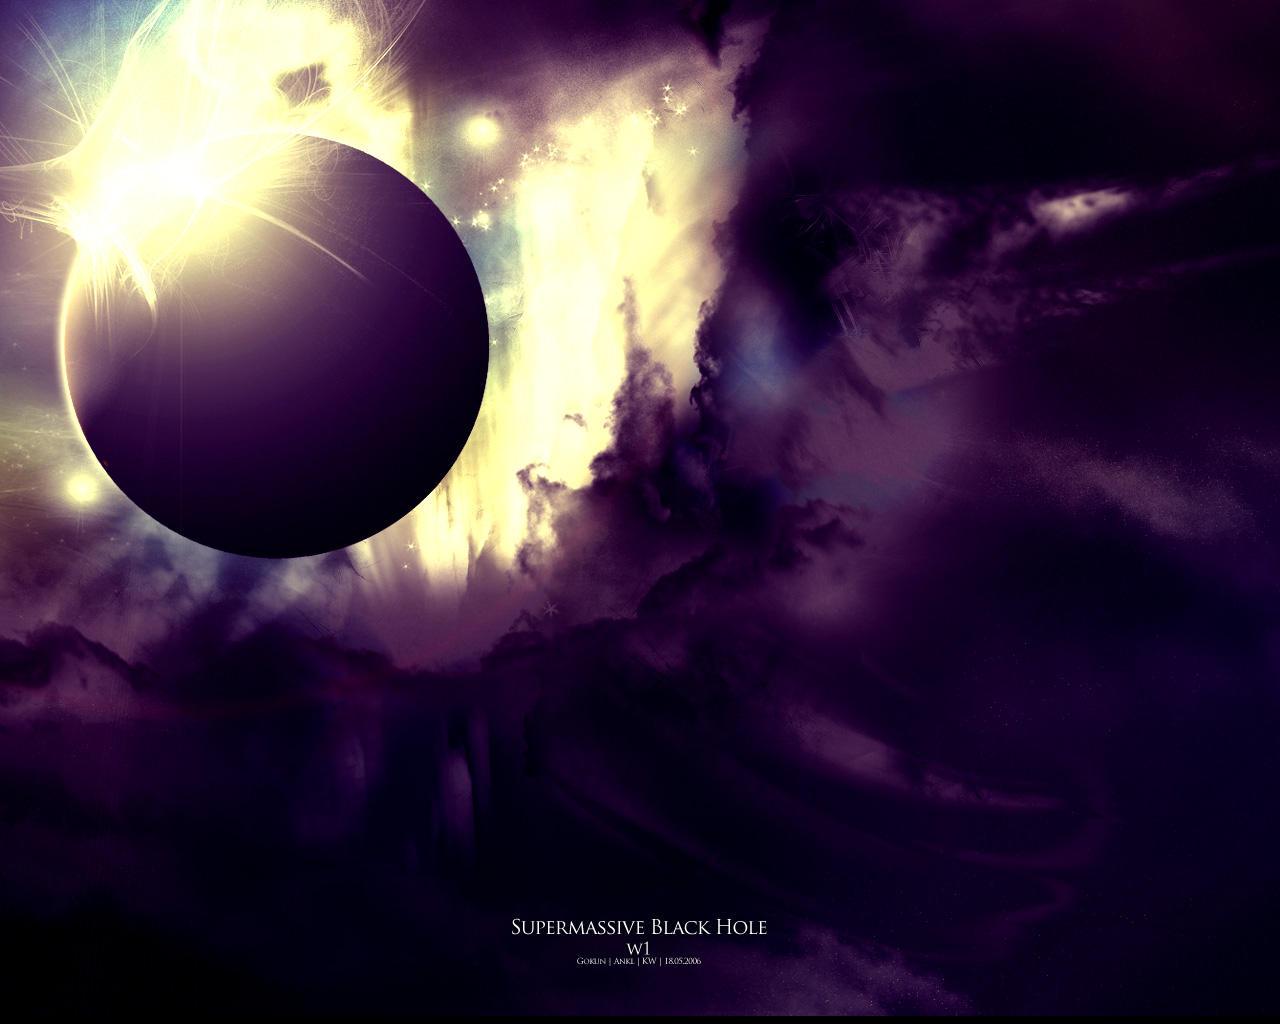 Supermassive Black Hole Wallpaper Supermassive Black Hole w1